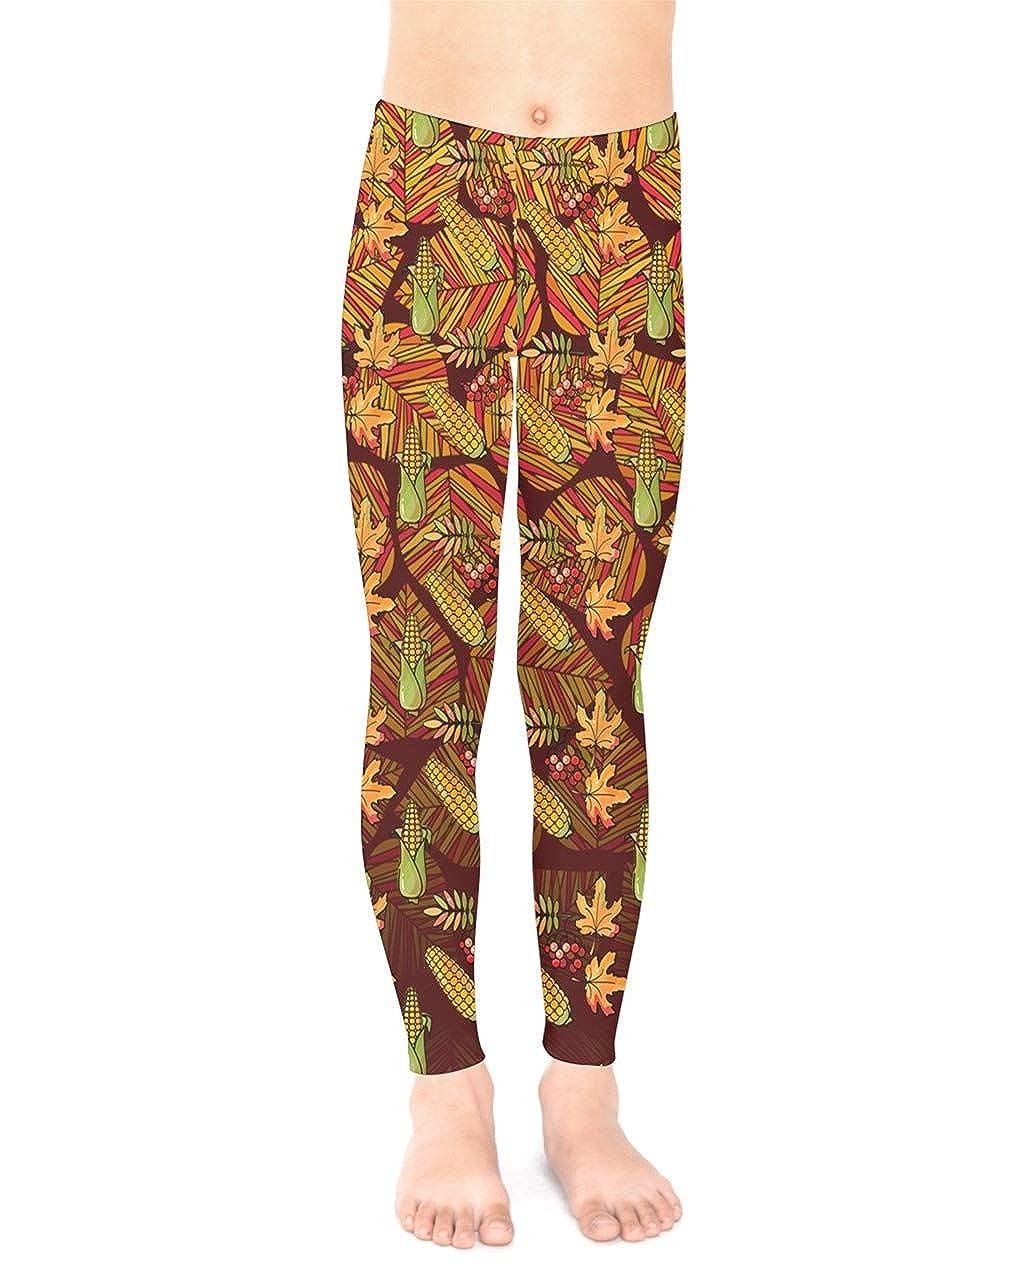 Size 2-16 PattyCandy Unisex Little /& Big Kids Stretchy Pants Autumn Leaves Heart Pattern Kids Leggings